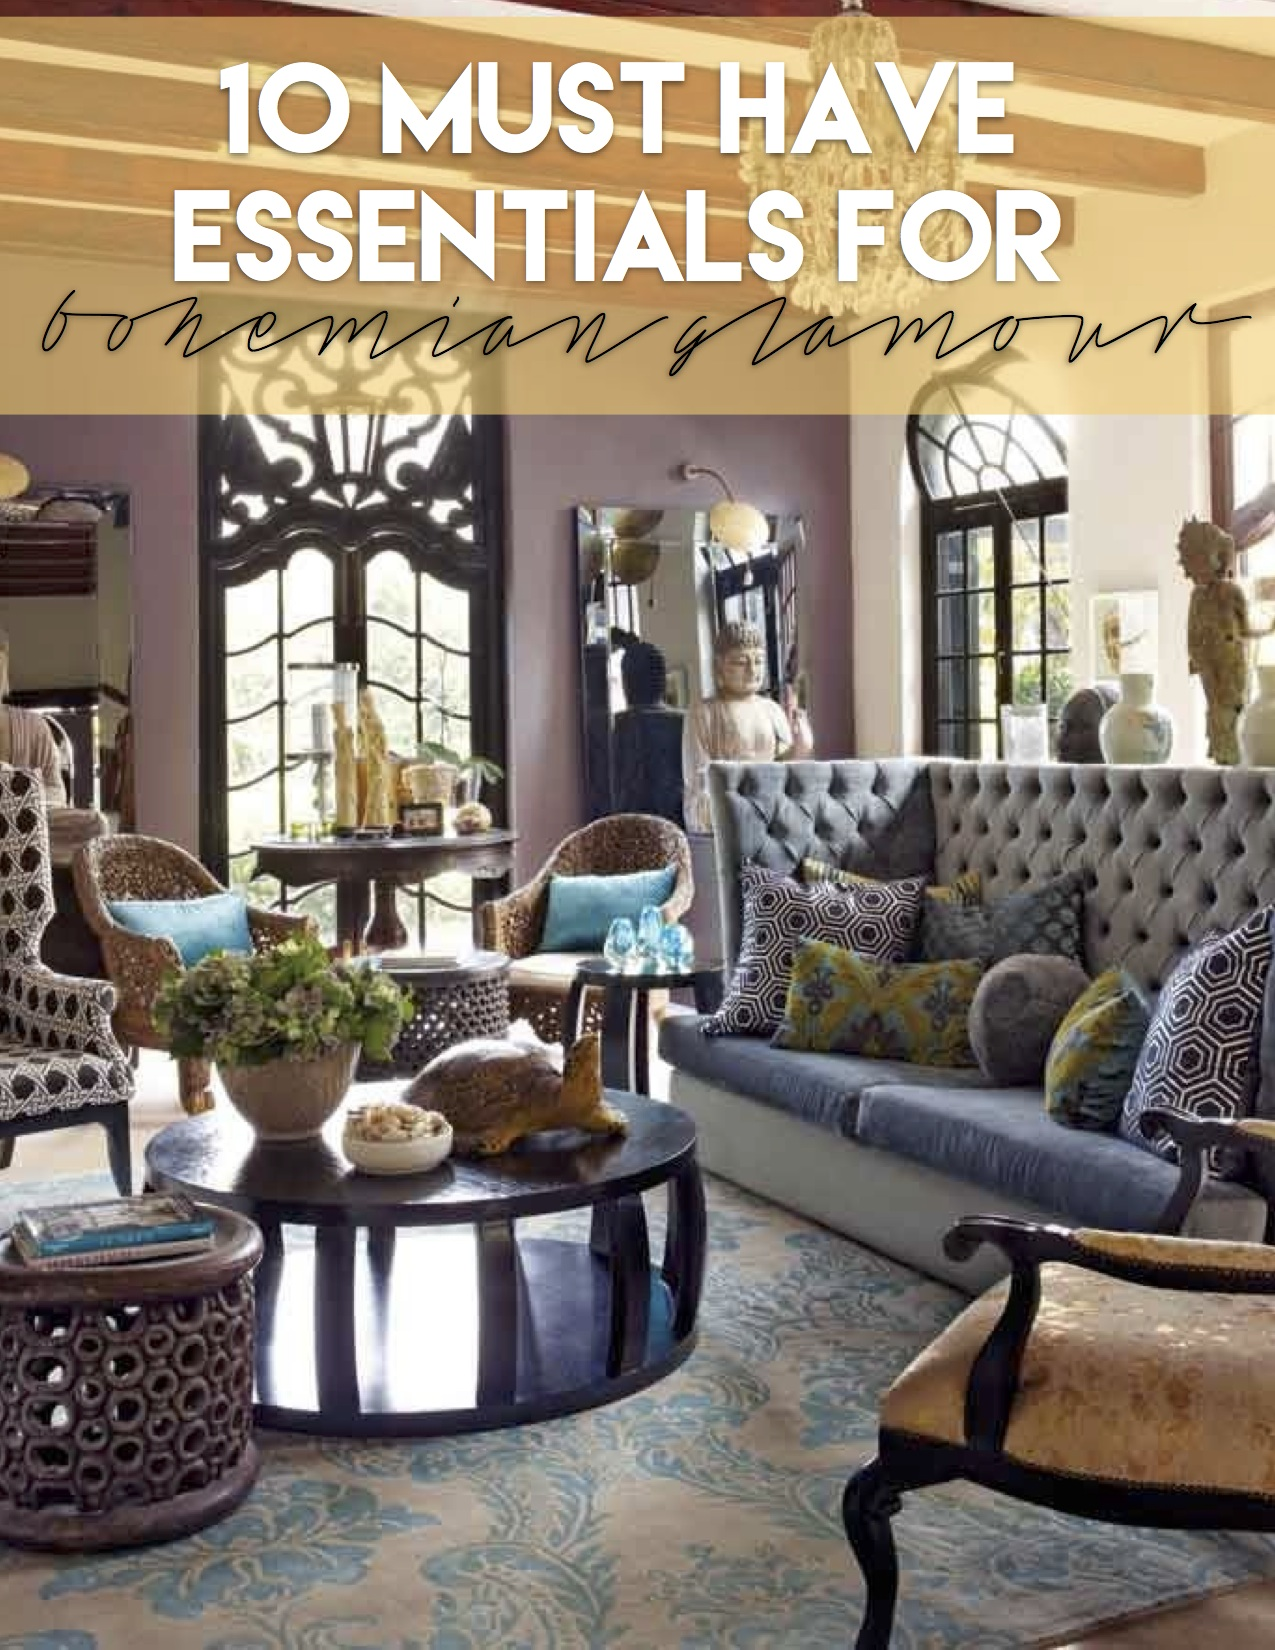 Bohemian Glamour 10 Must Have Decorating Essentials Ashlina Kaposta